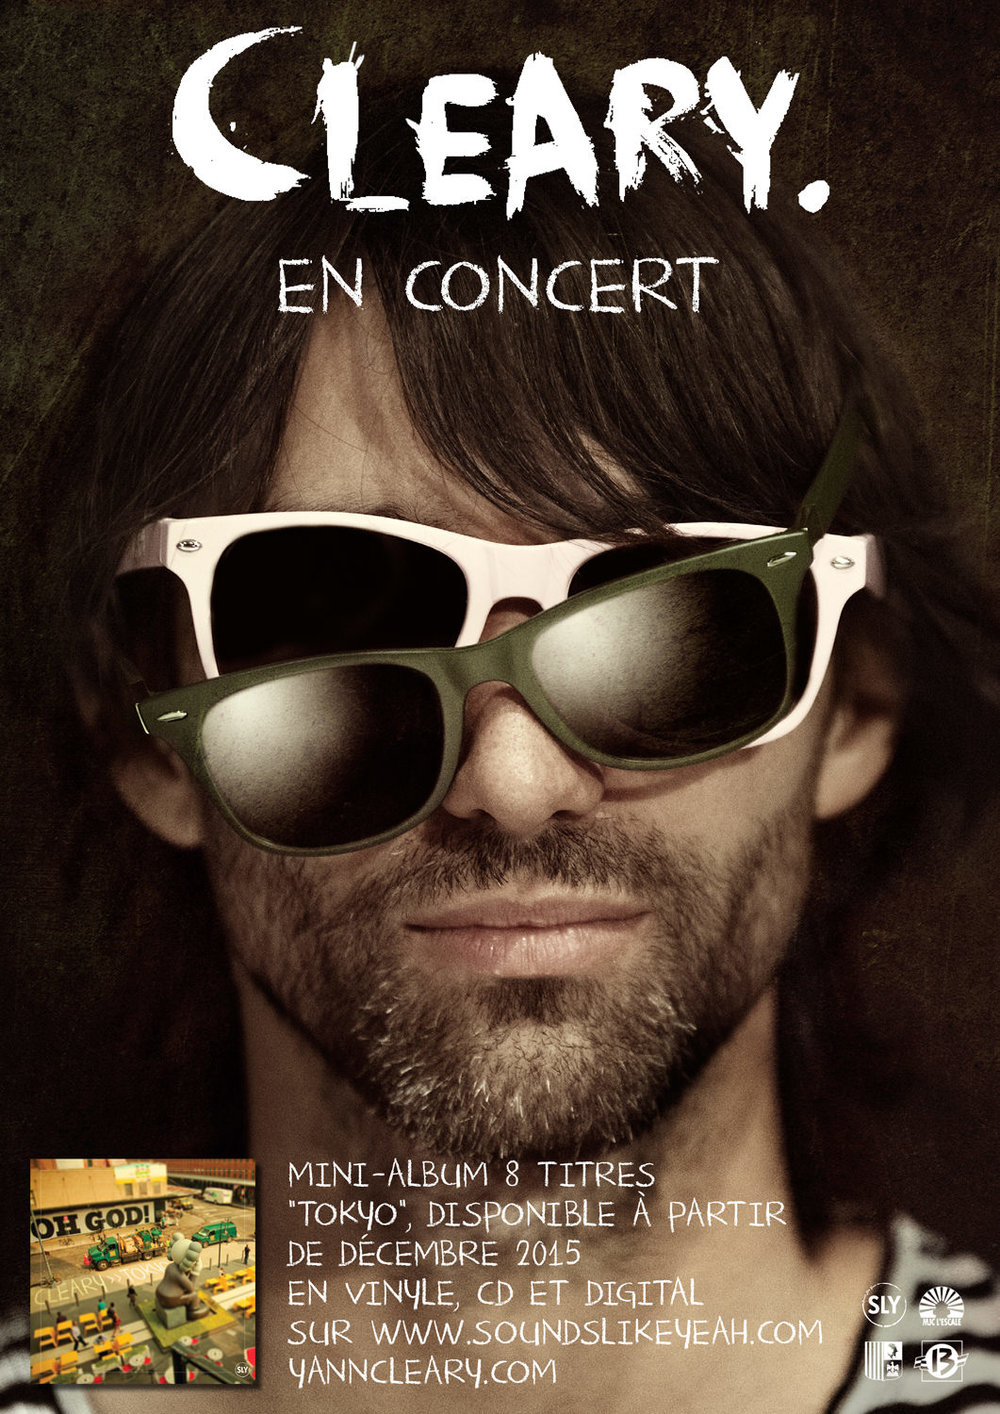 Yann-Cleary_en_concertSwwetshop_Revolution_Edinburgh_Fringe_I_Love_You_and_I_loved_You_photo_Danilo_Moroni.jpg